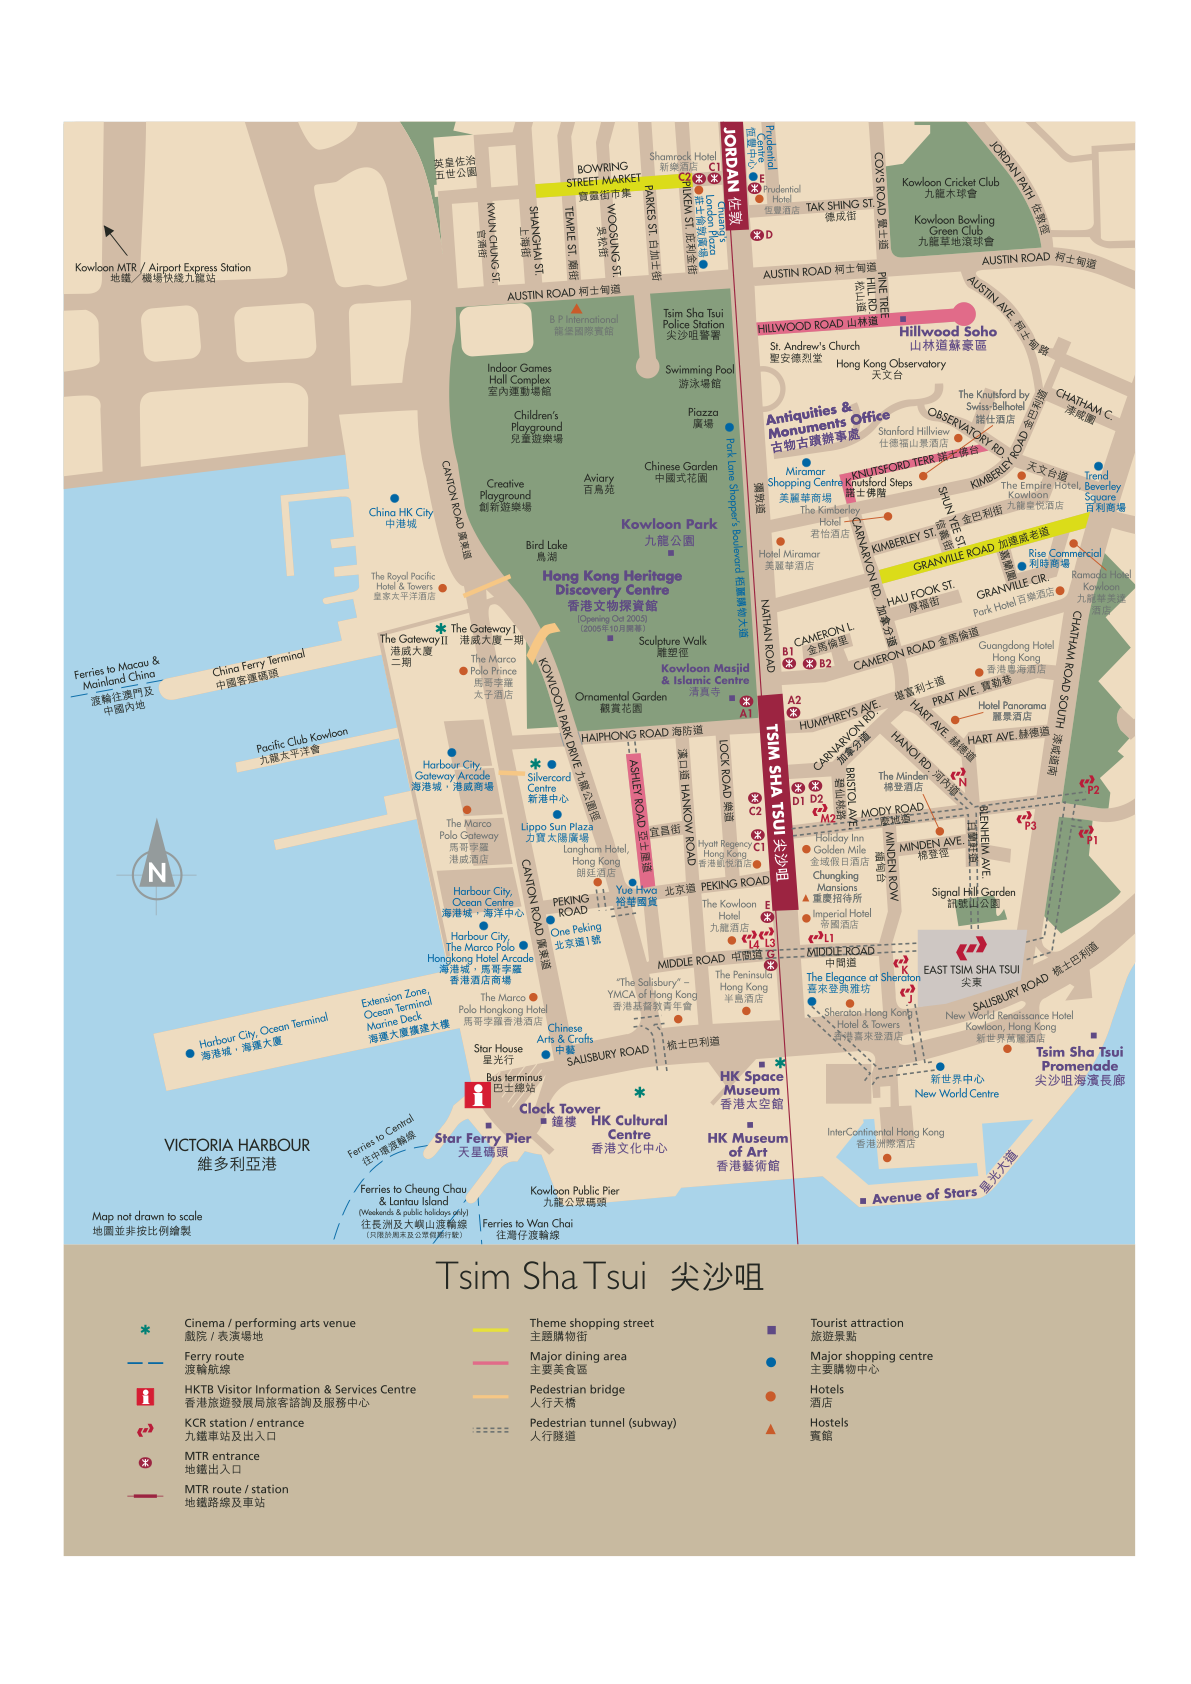 Tsim Sha Tsui Hong Kong Map